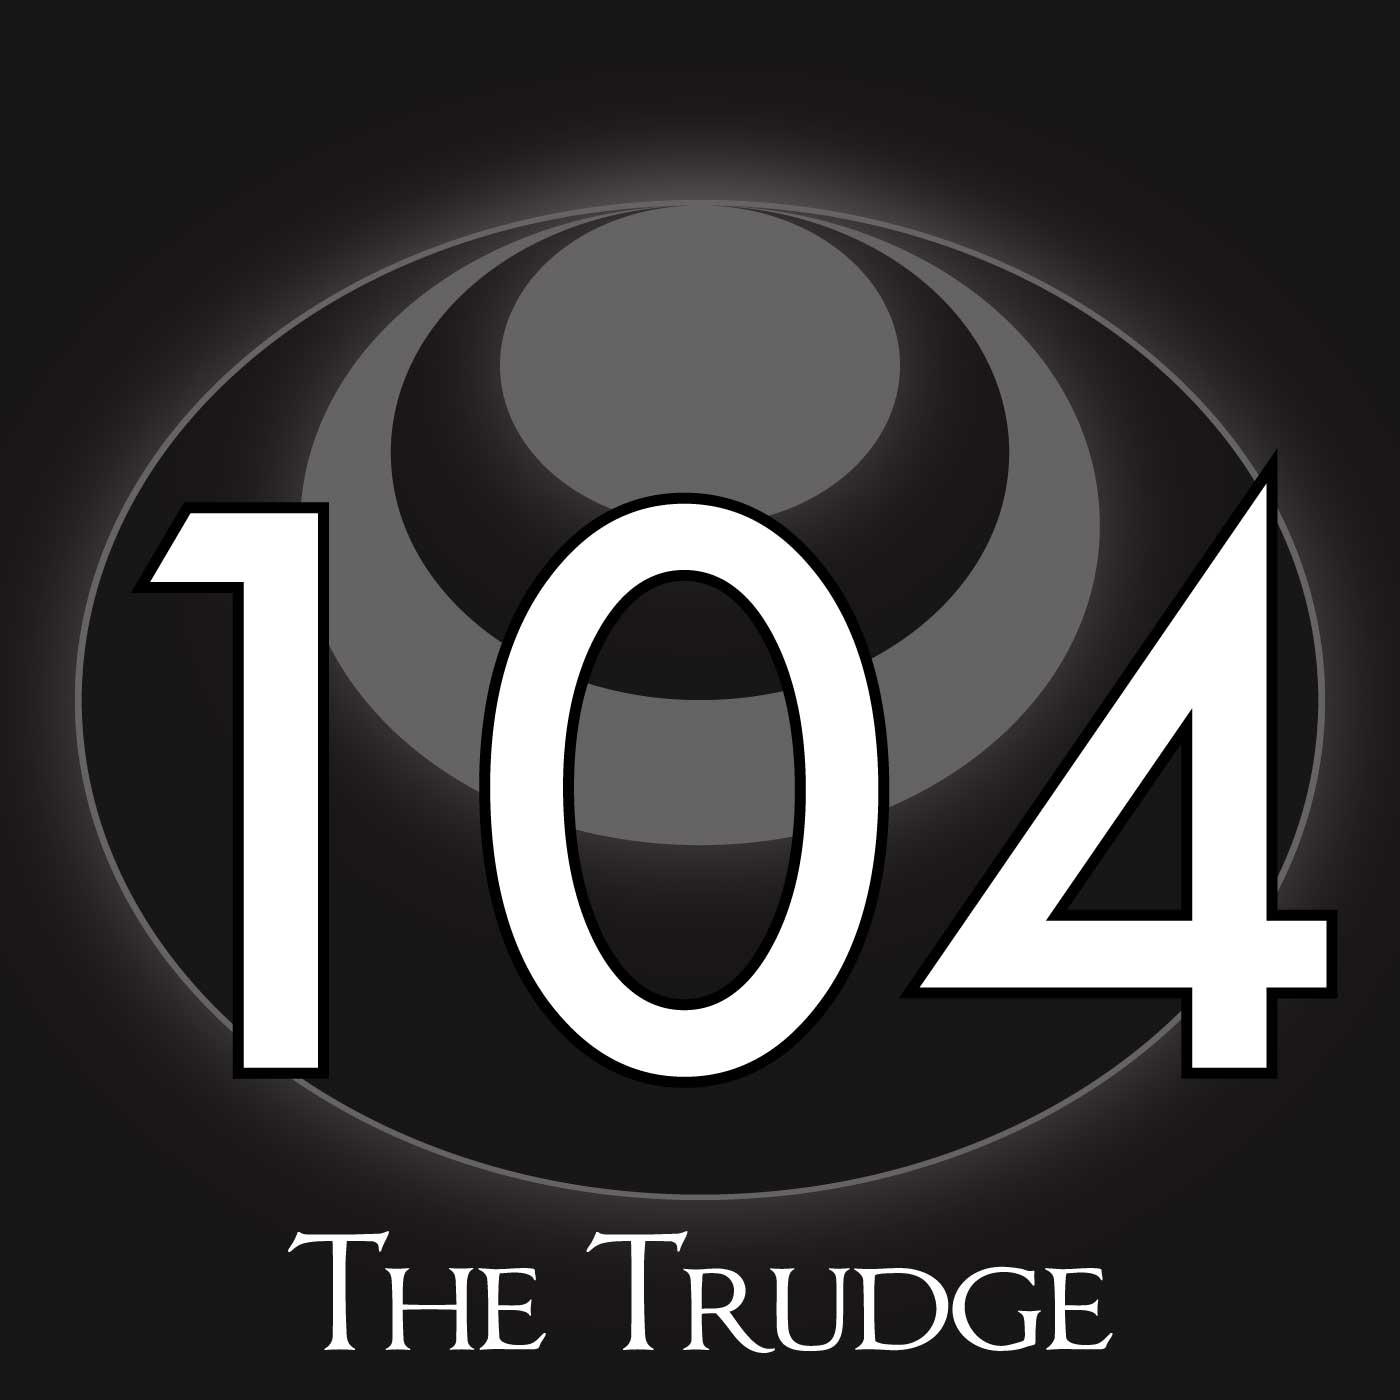 104 The Trudge Kakos Industries